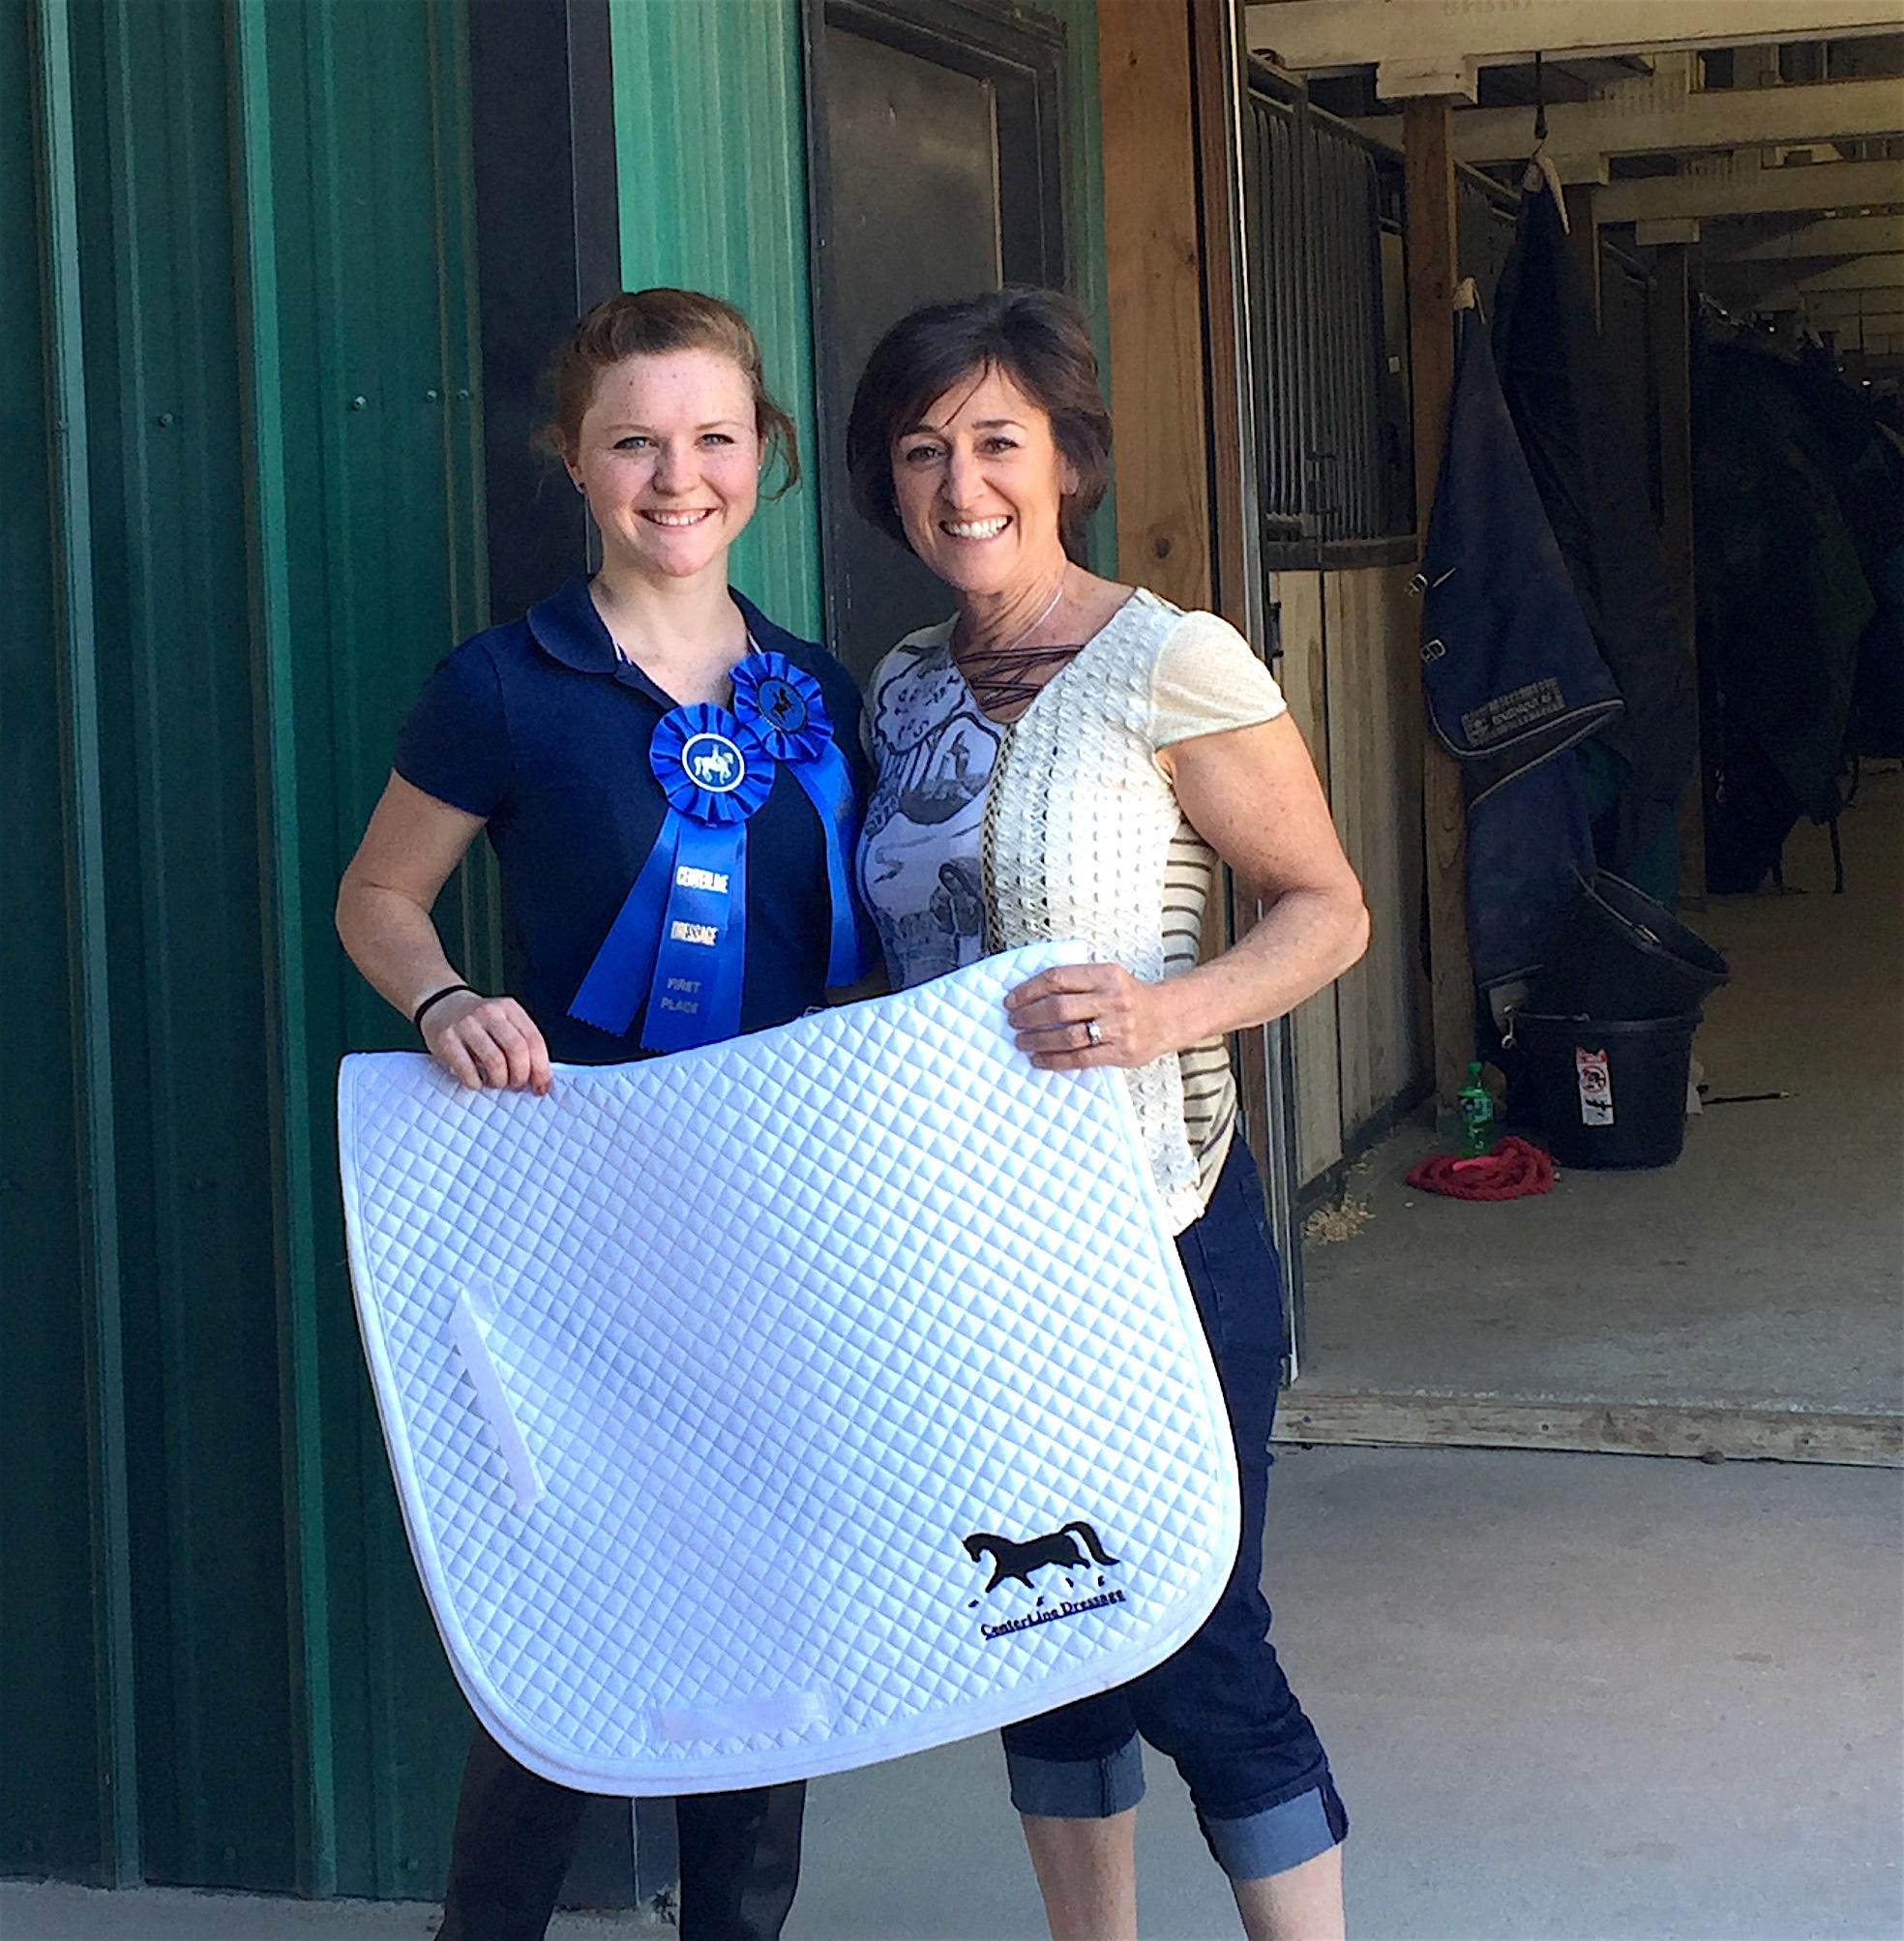 2016 IceBreaker High Point Winner Chrissy Jacobs w/ CLD President Judy Nordstrom